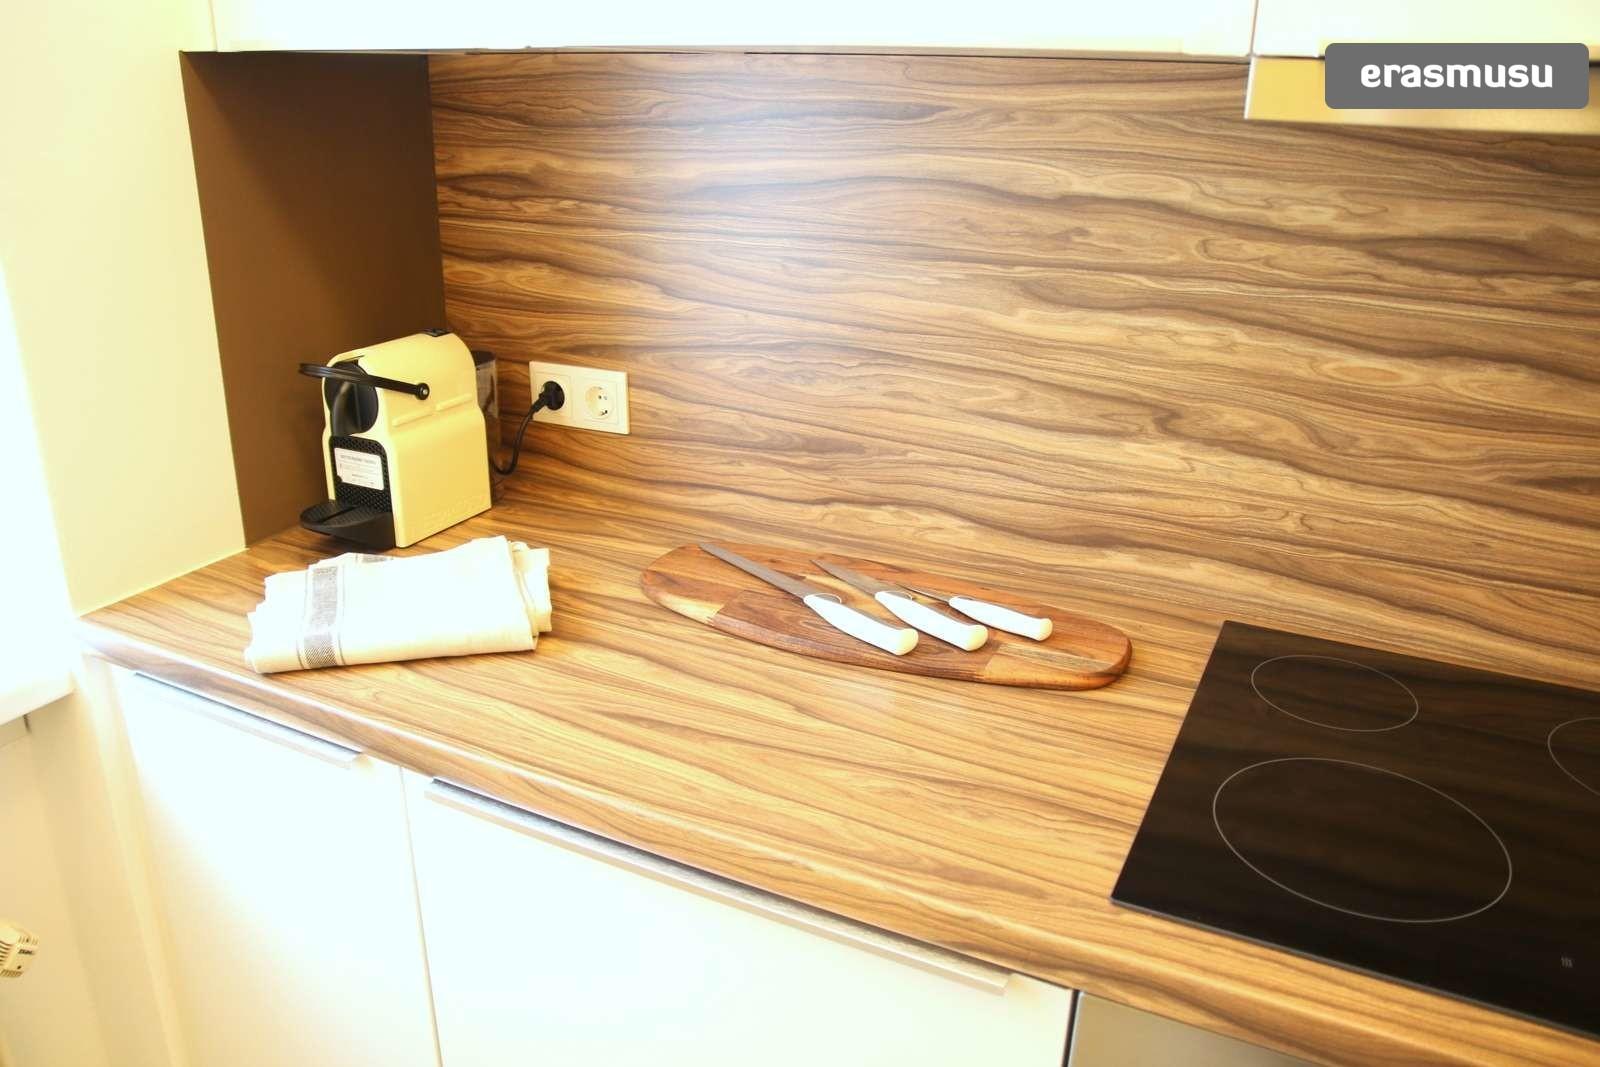 charming-studio-apartment-rent-wahring-b77c4a79e59638a4fe12473d2